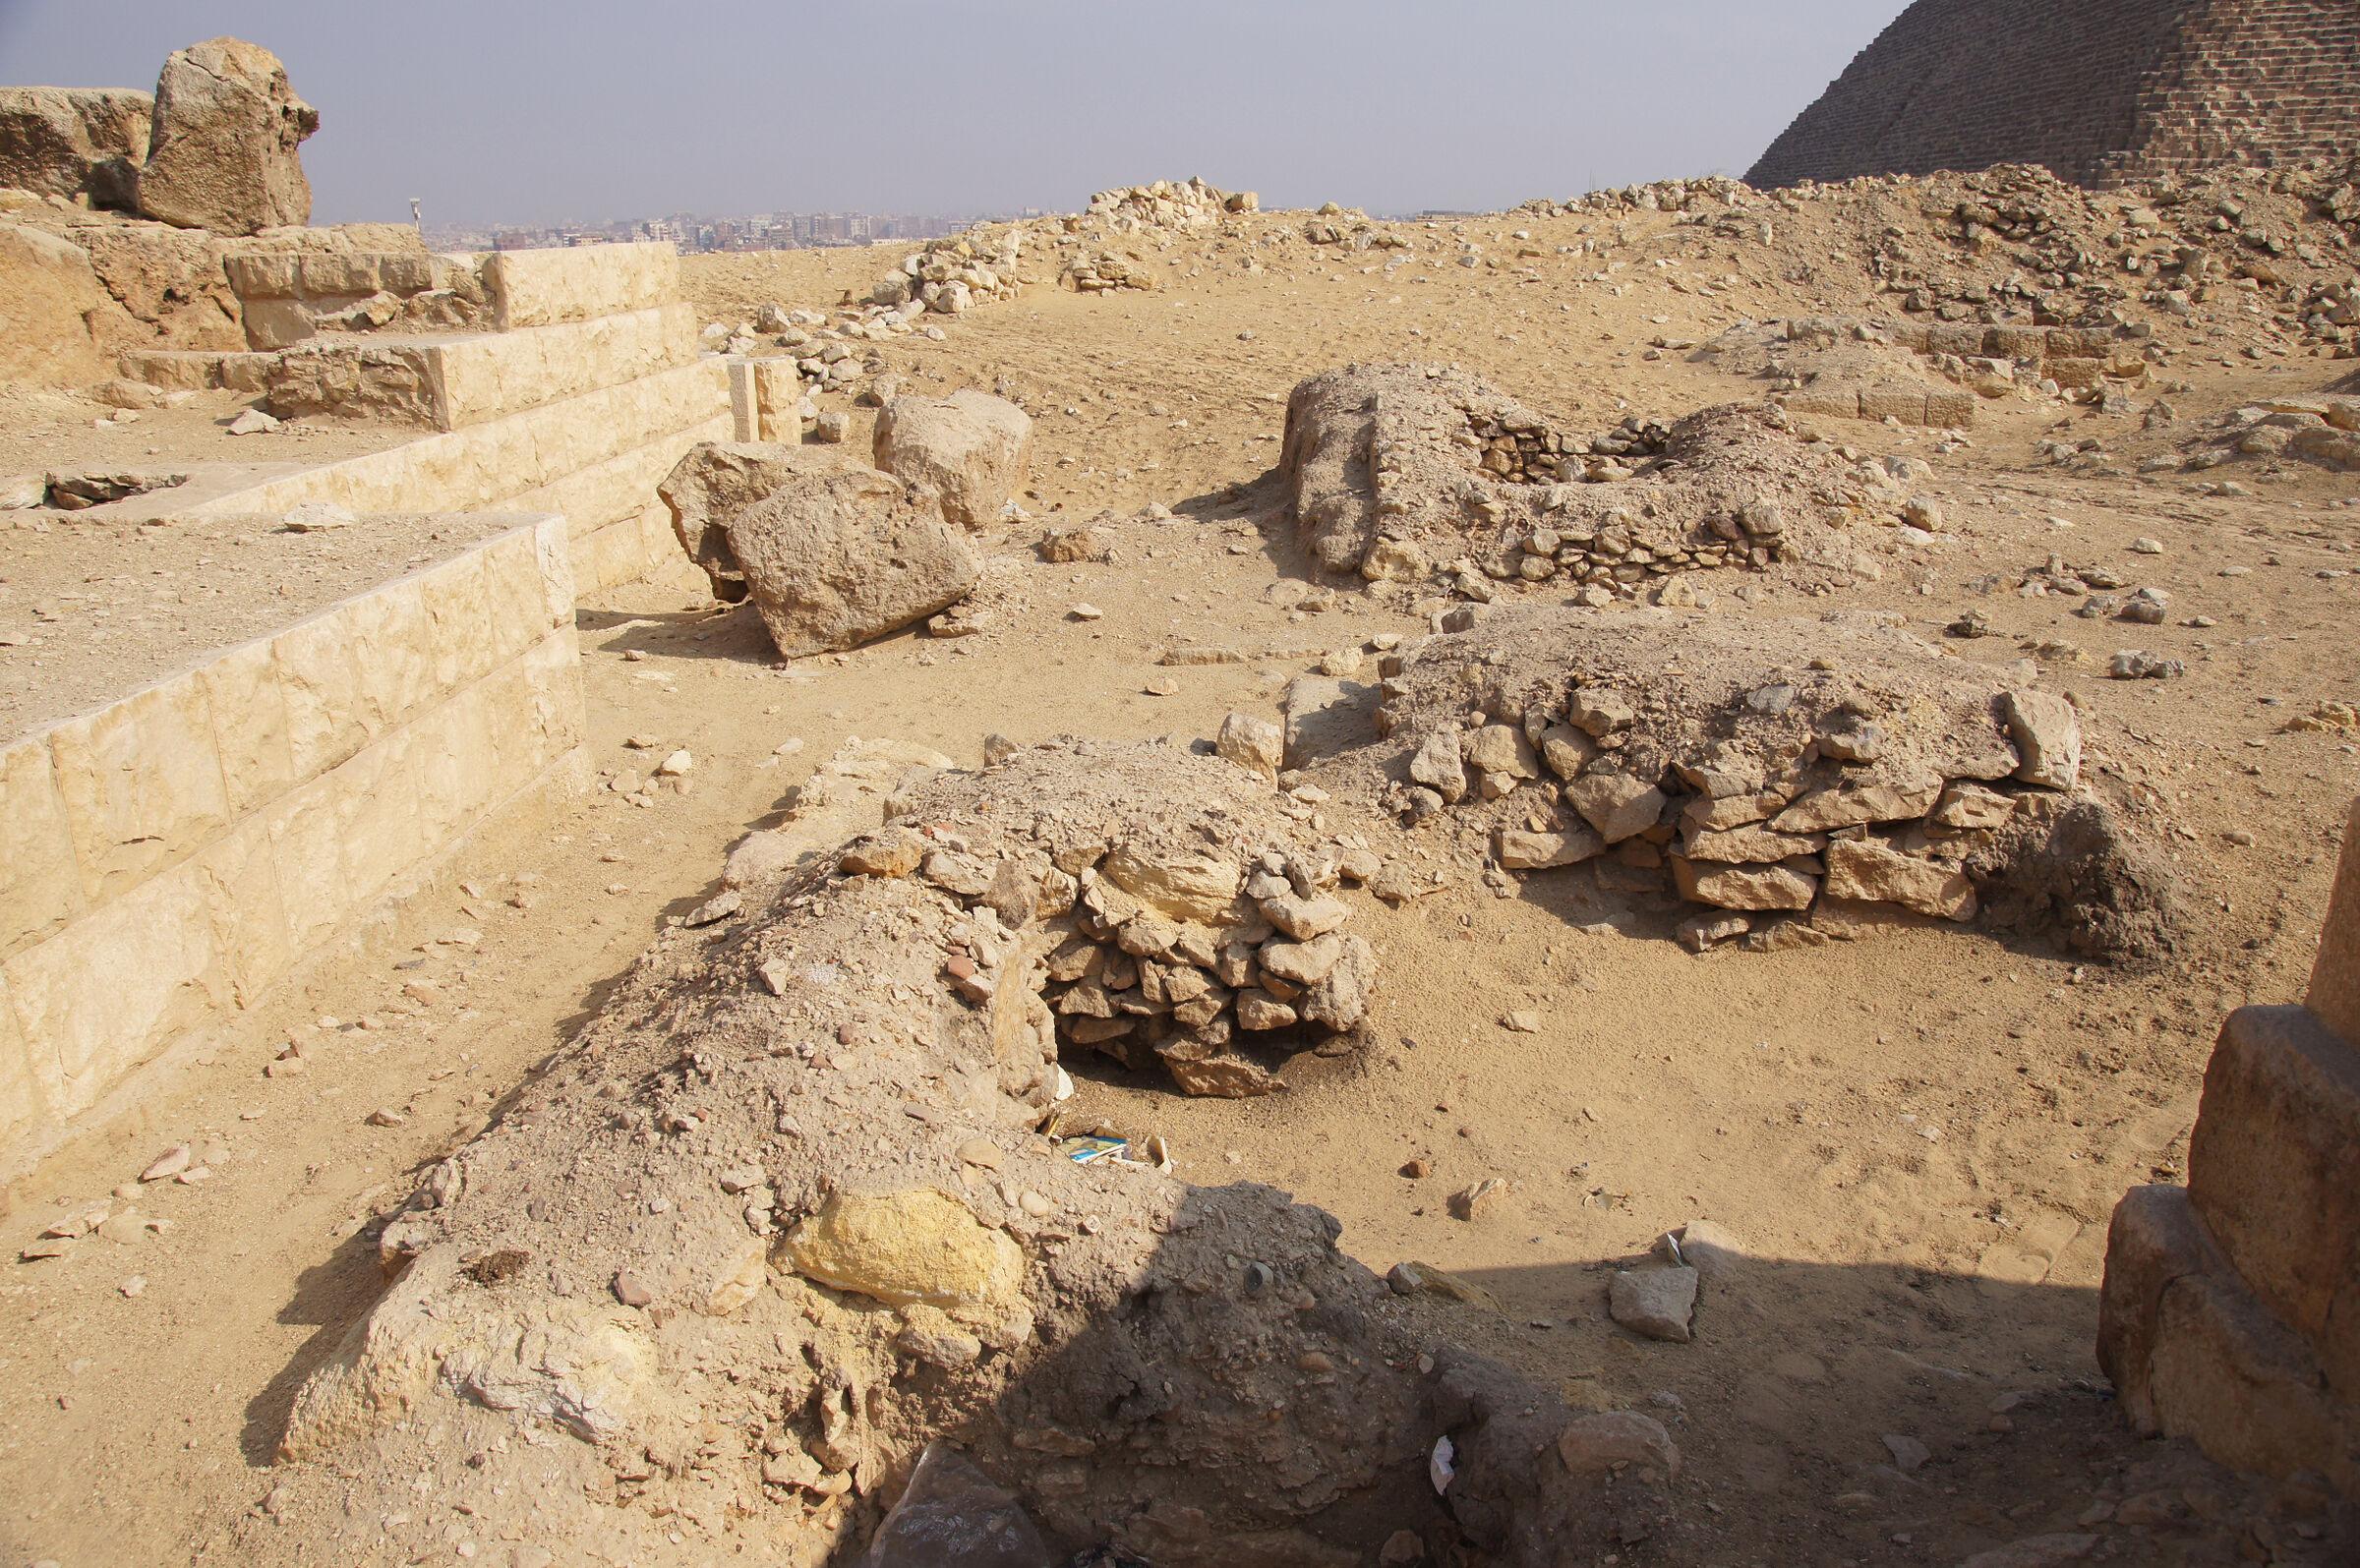 Western Cemetery: Site: Giza; View: G 2152, G 2153, G 2138, G 2156', Khufu Pyramid